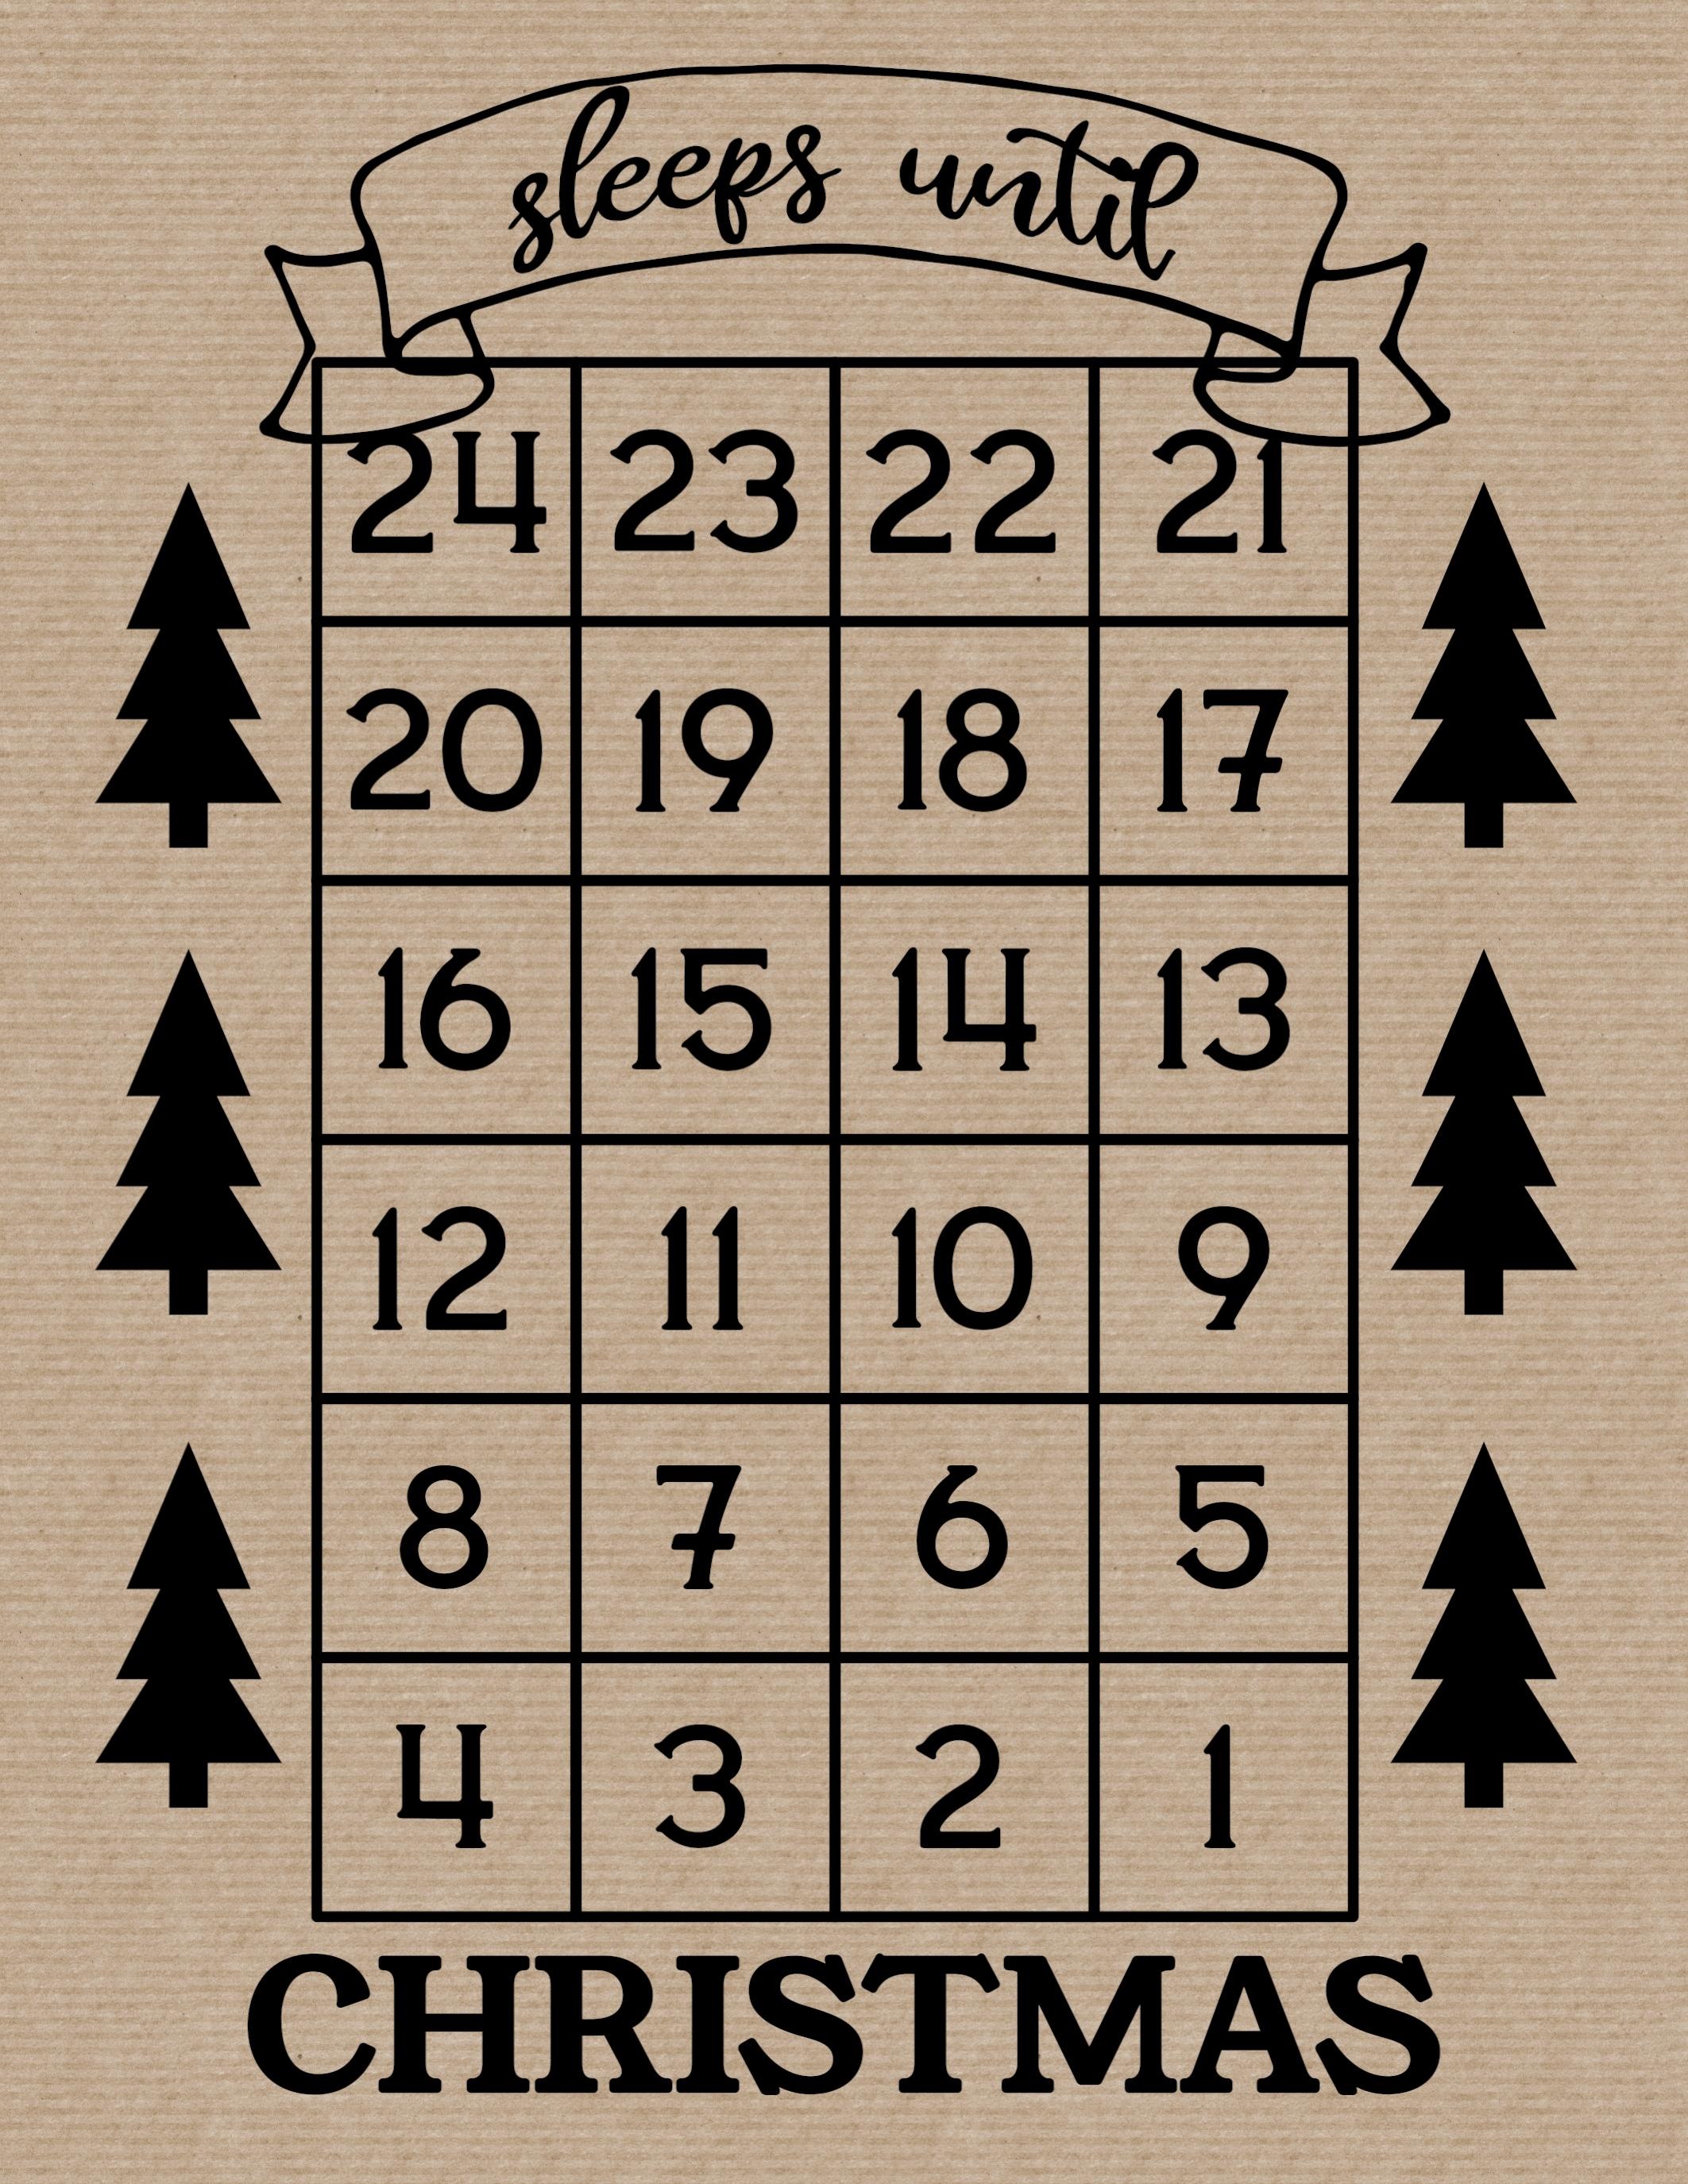 How Many Days Until Christmas Free Printable - Paper Trail Impressive Xmas Countdown 2020 Clendar Printable